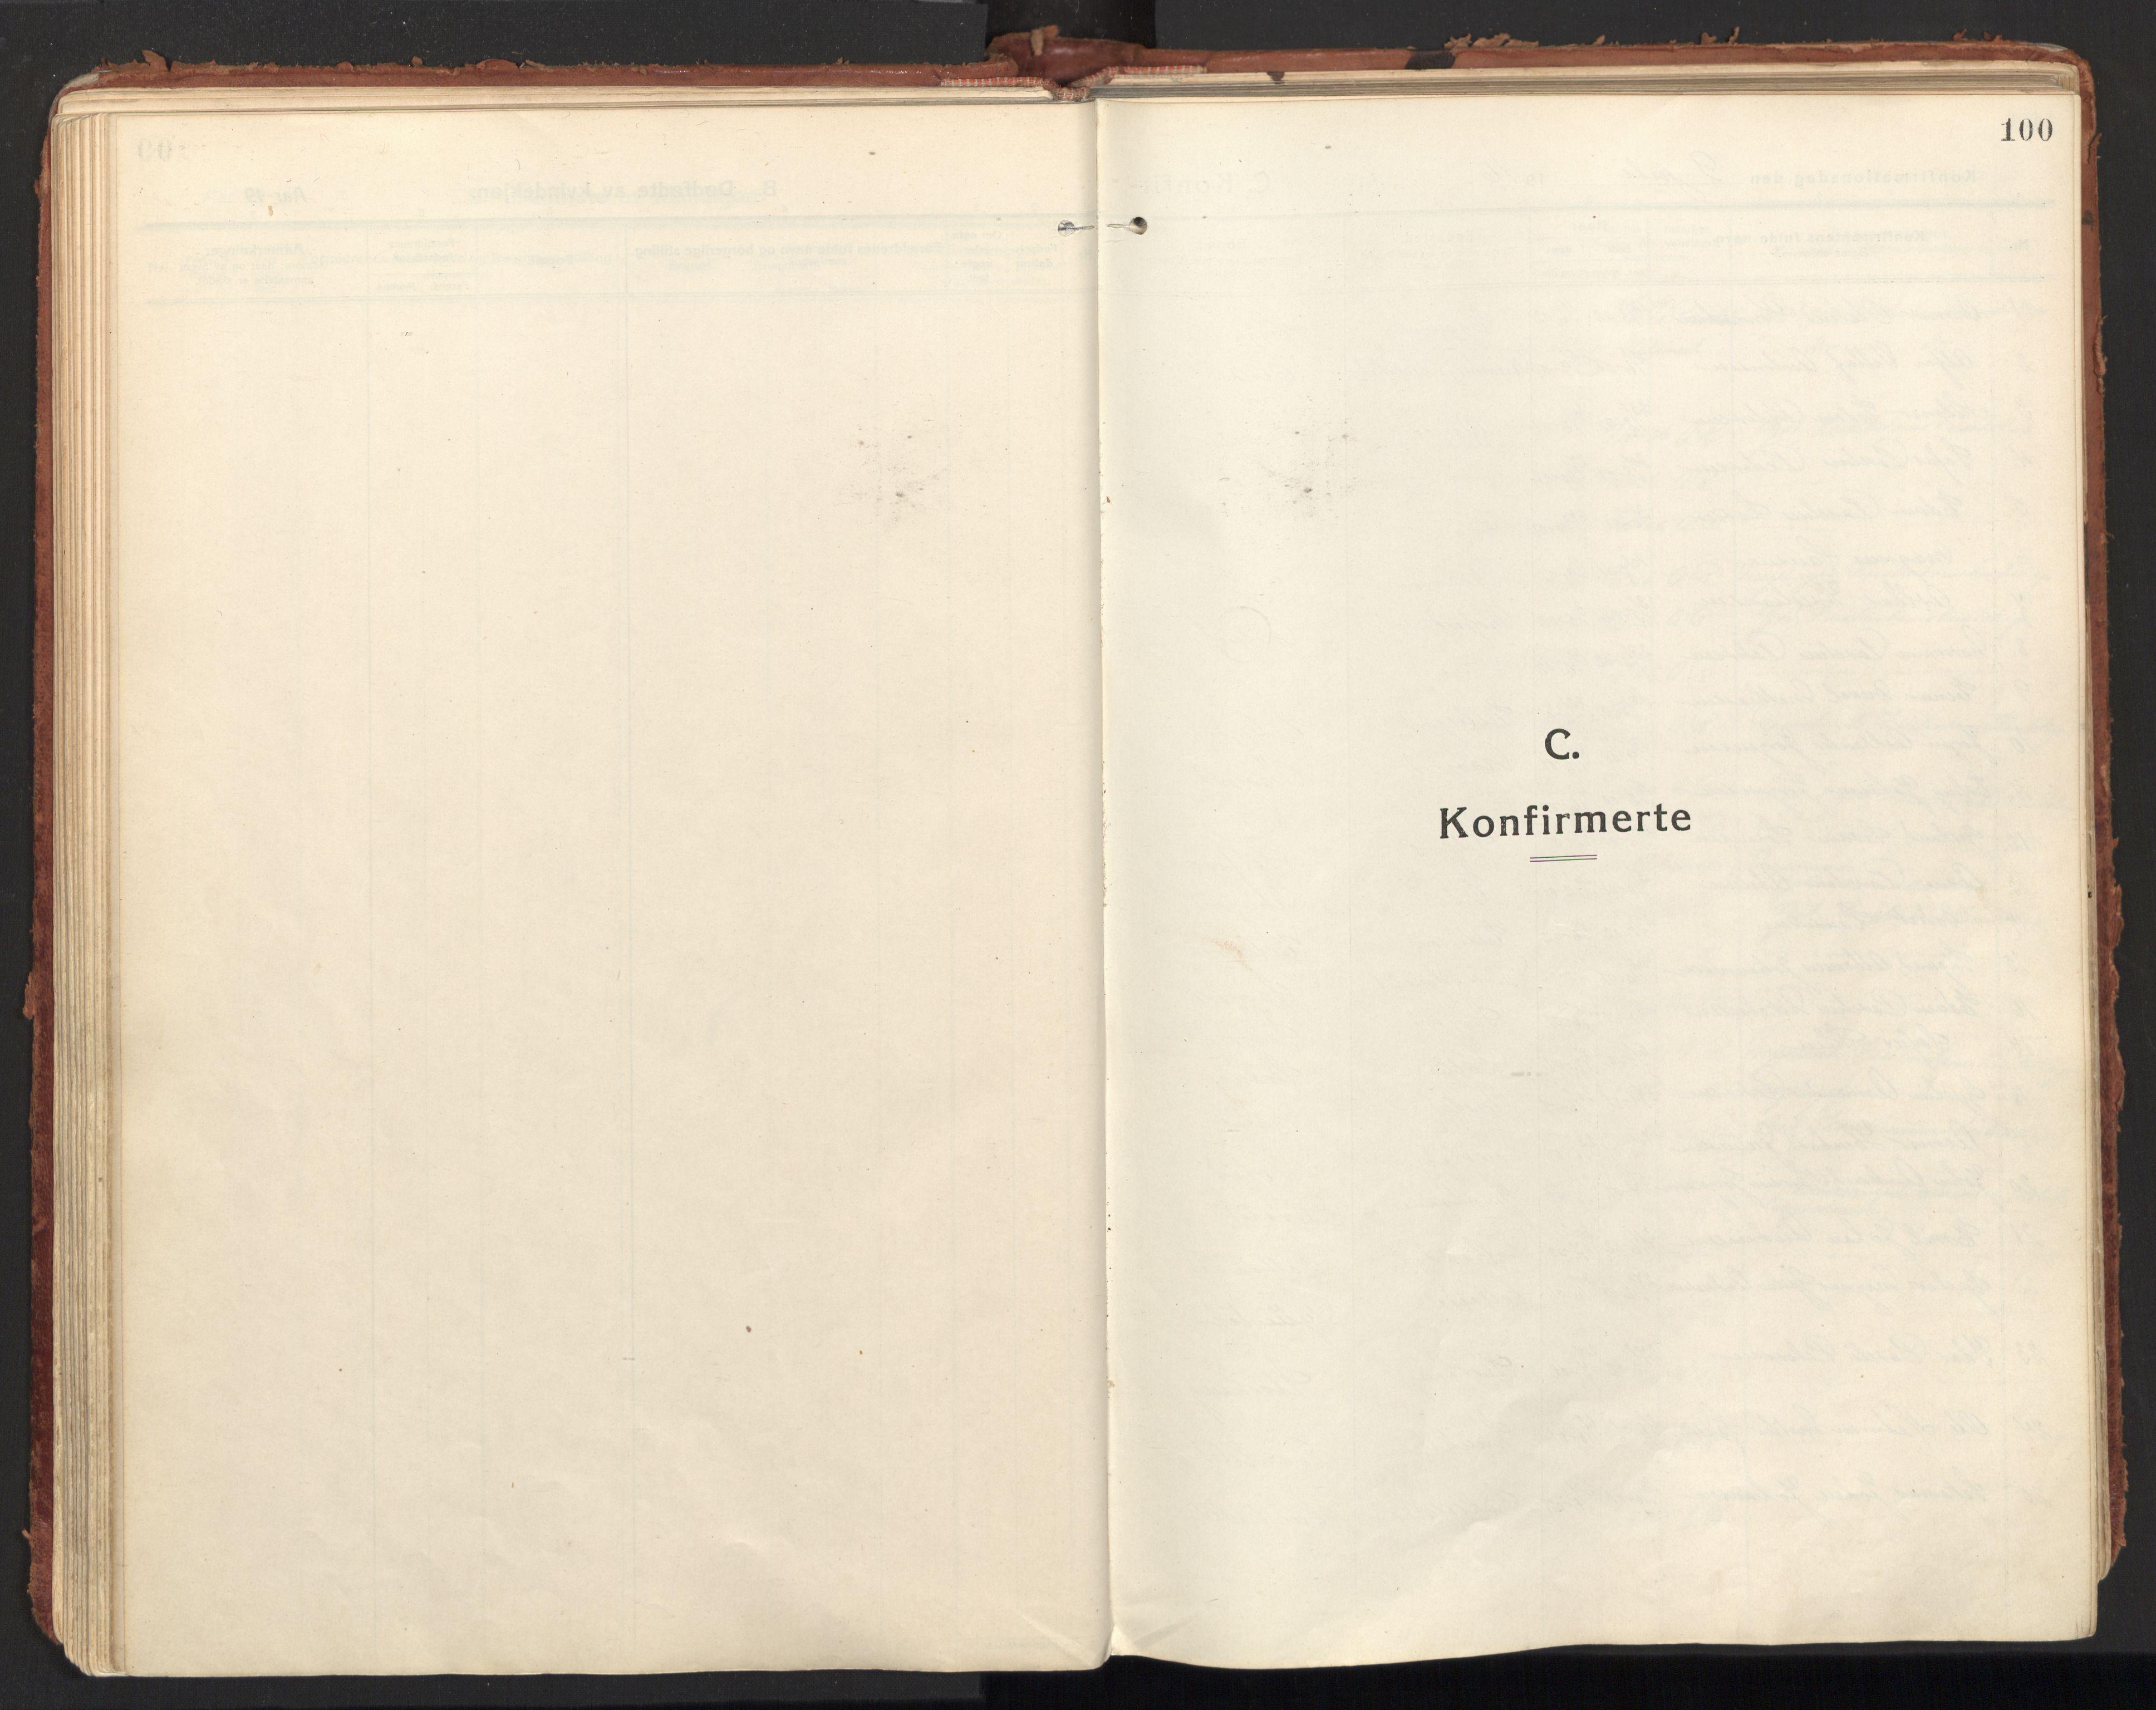 SAT, Ministerialprotokoller, klokkerbøker og fødselsregistre - Nordland, 846/L0650: Ministerialbok nr. 846A08, 1916-1935, s. 100